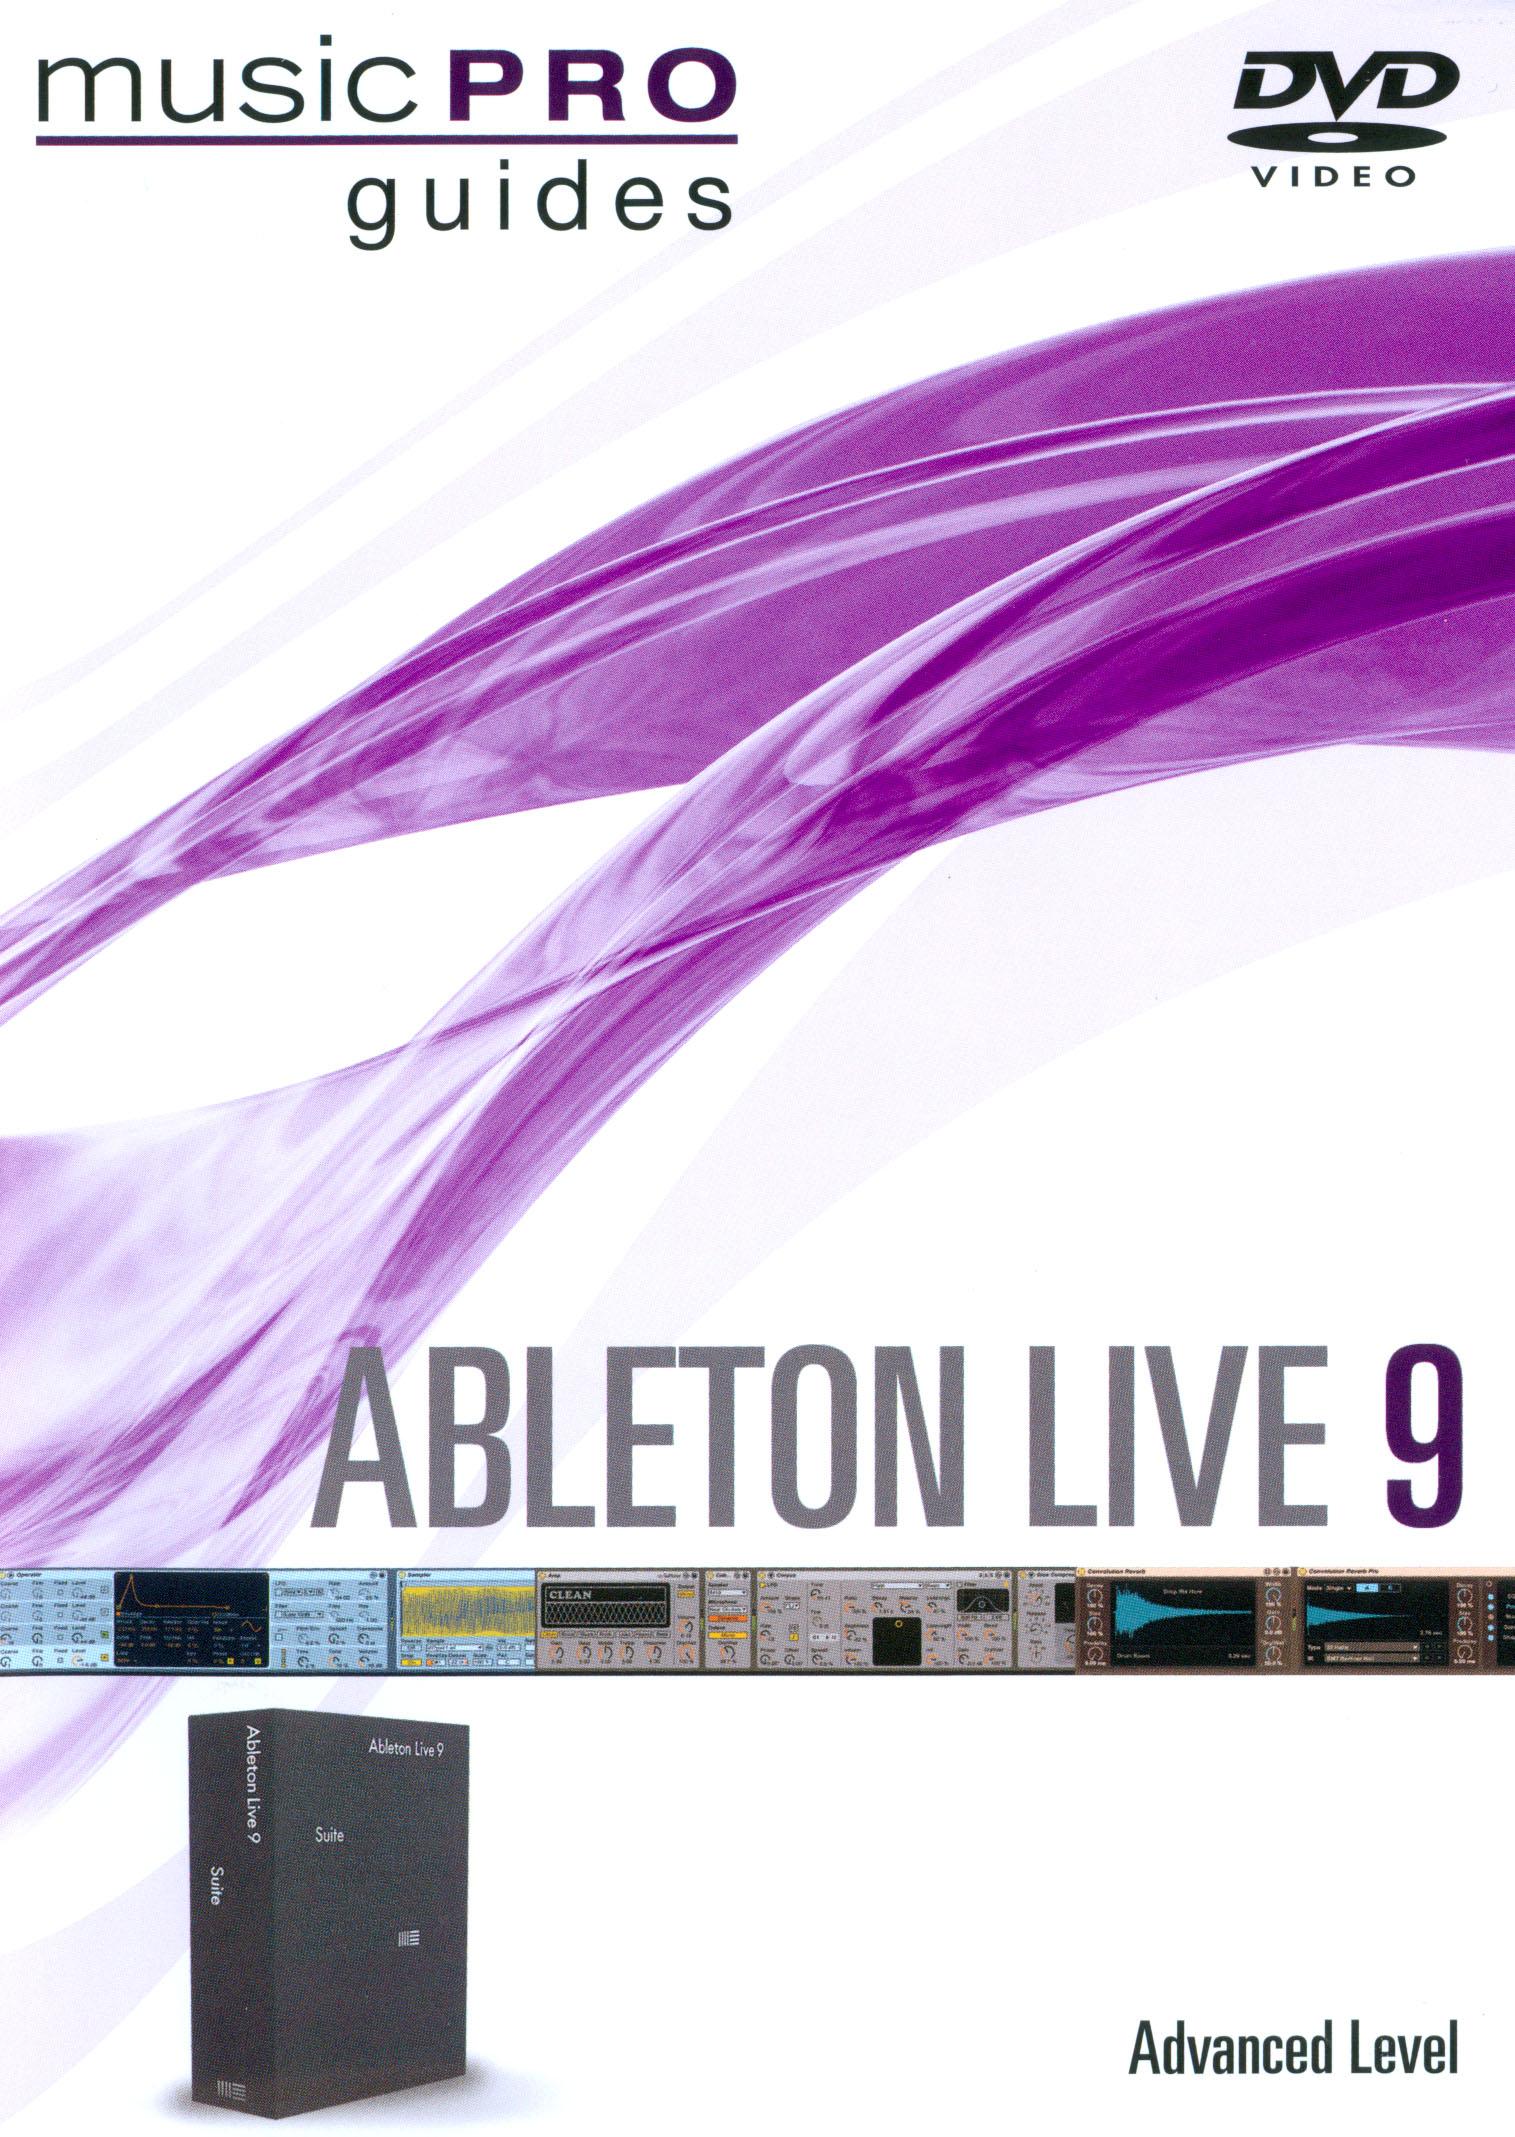 Music Pro Guides: Ableton Live 9 - Advanced Level